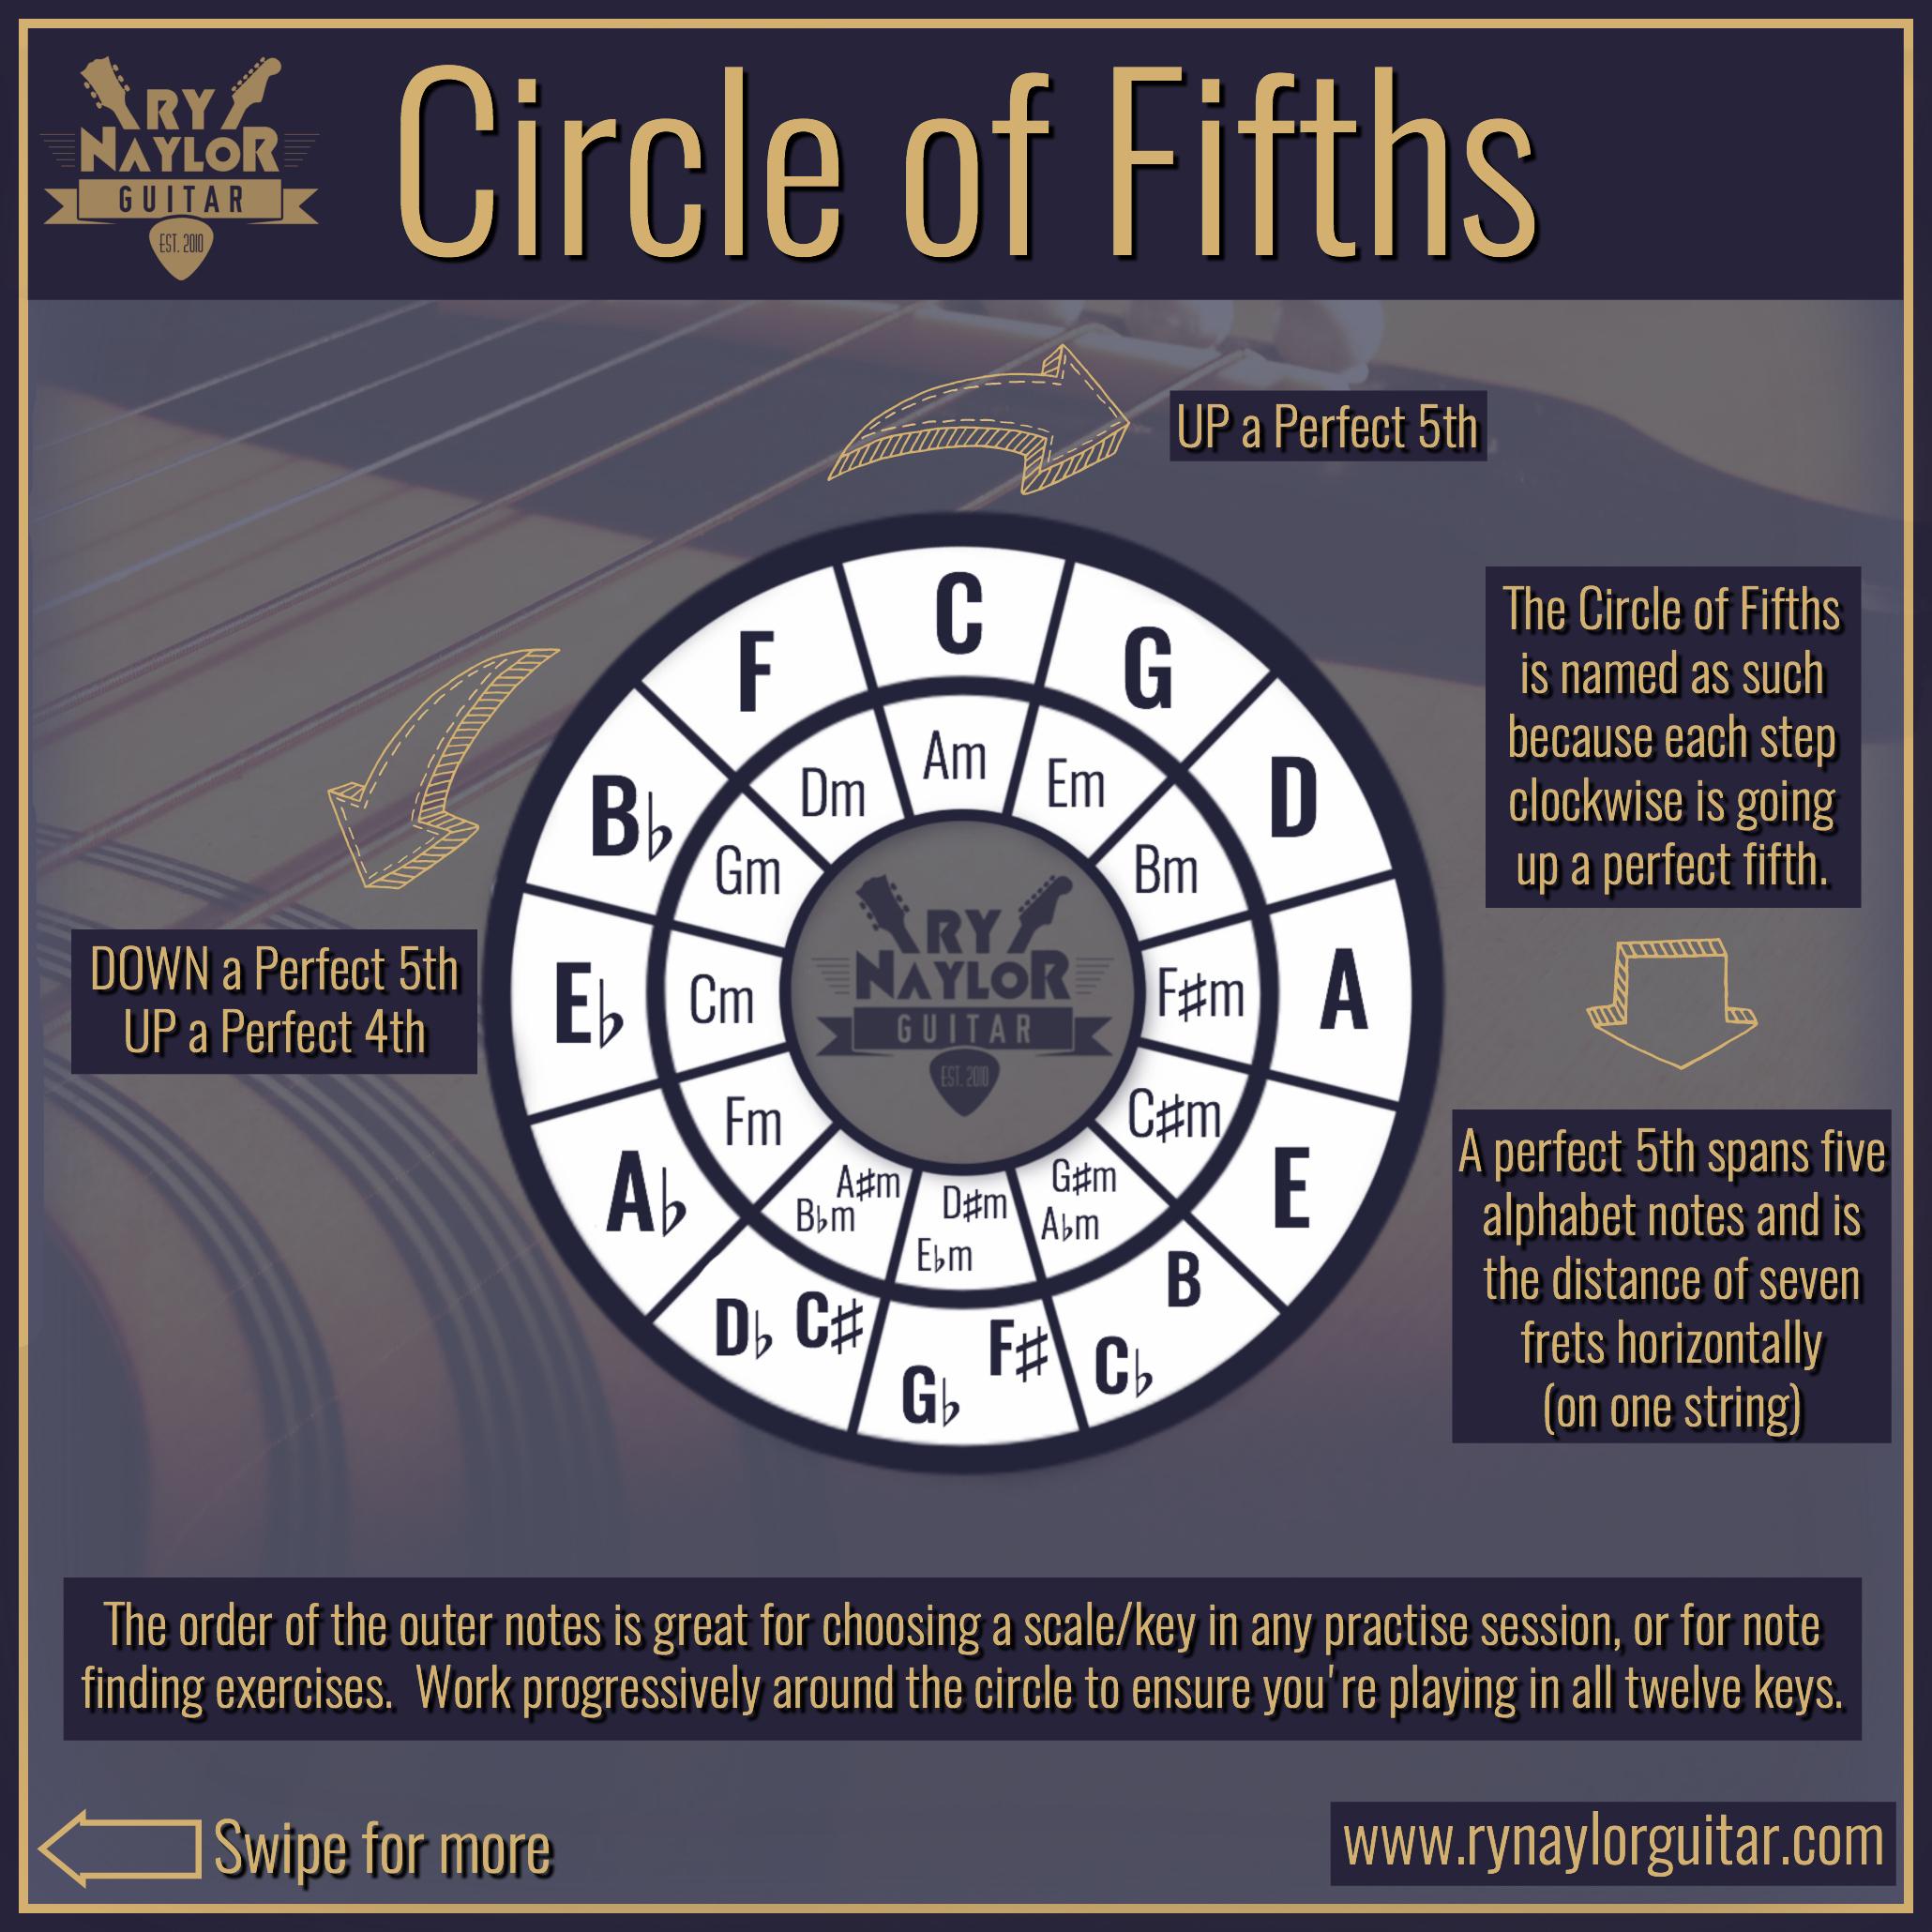 Circle of Fifths 1.jpg